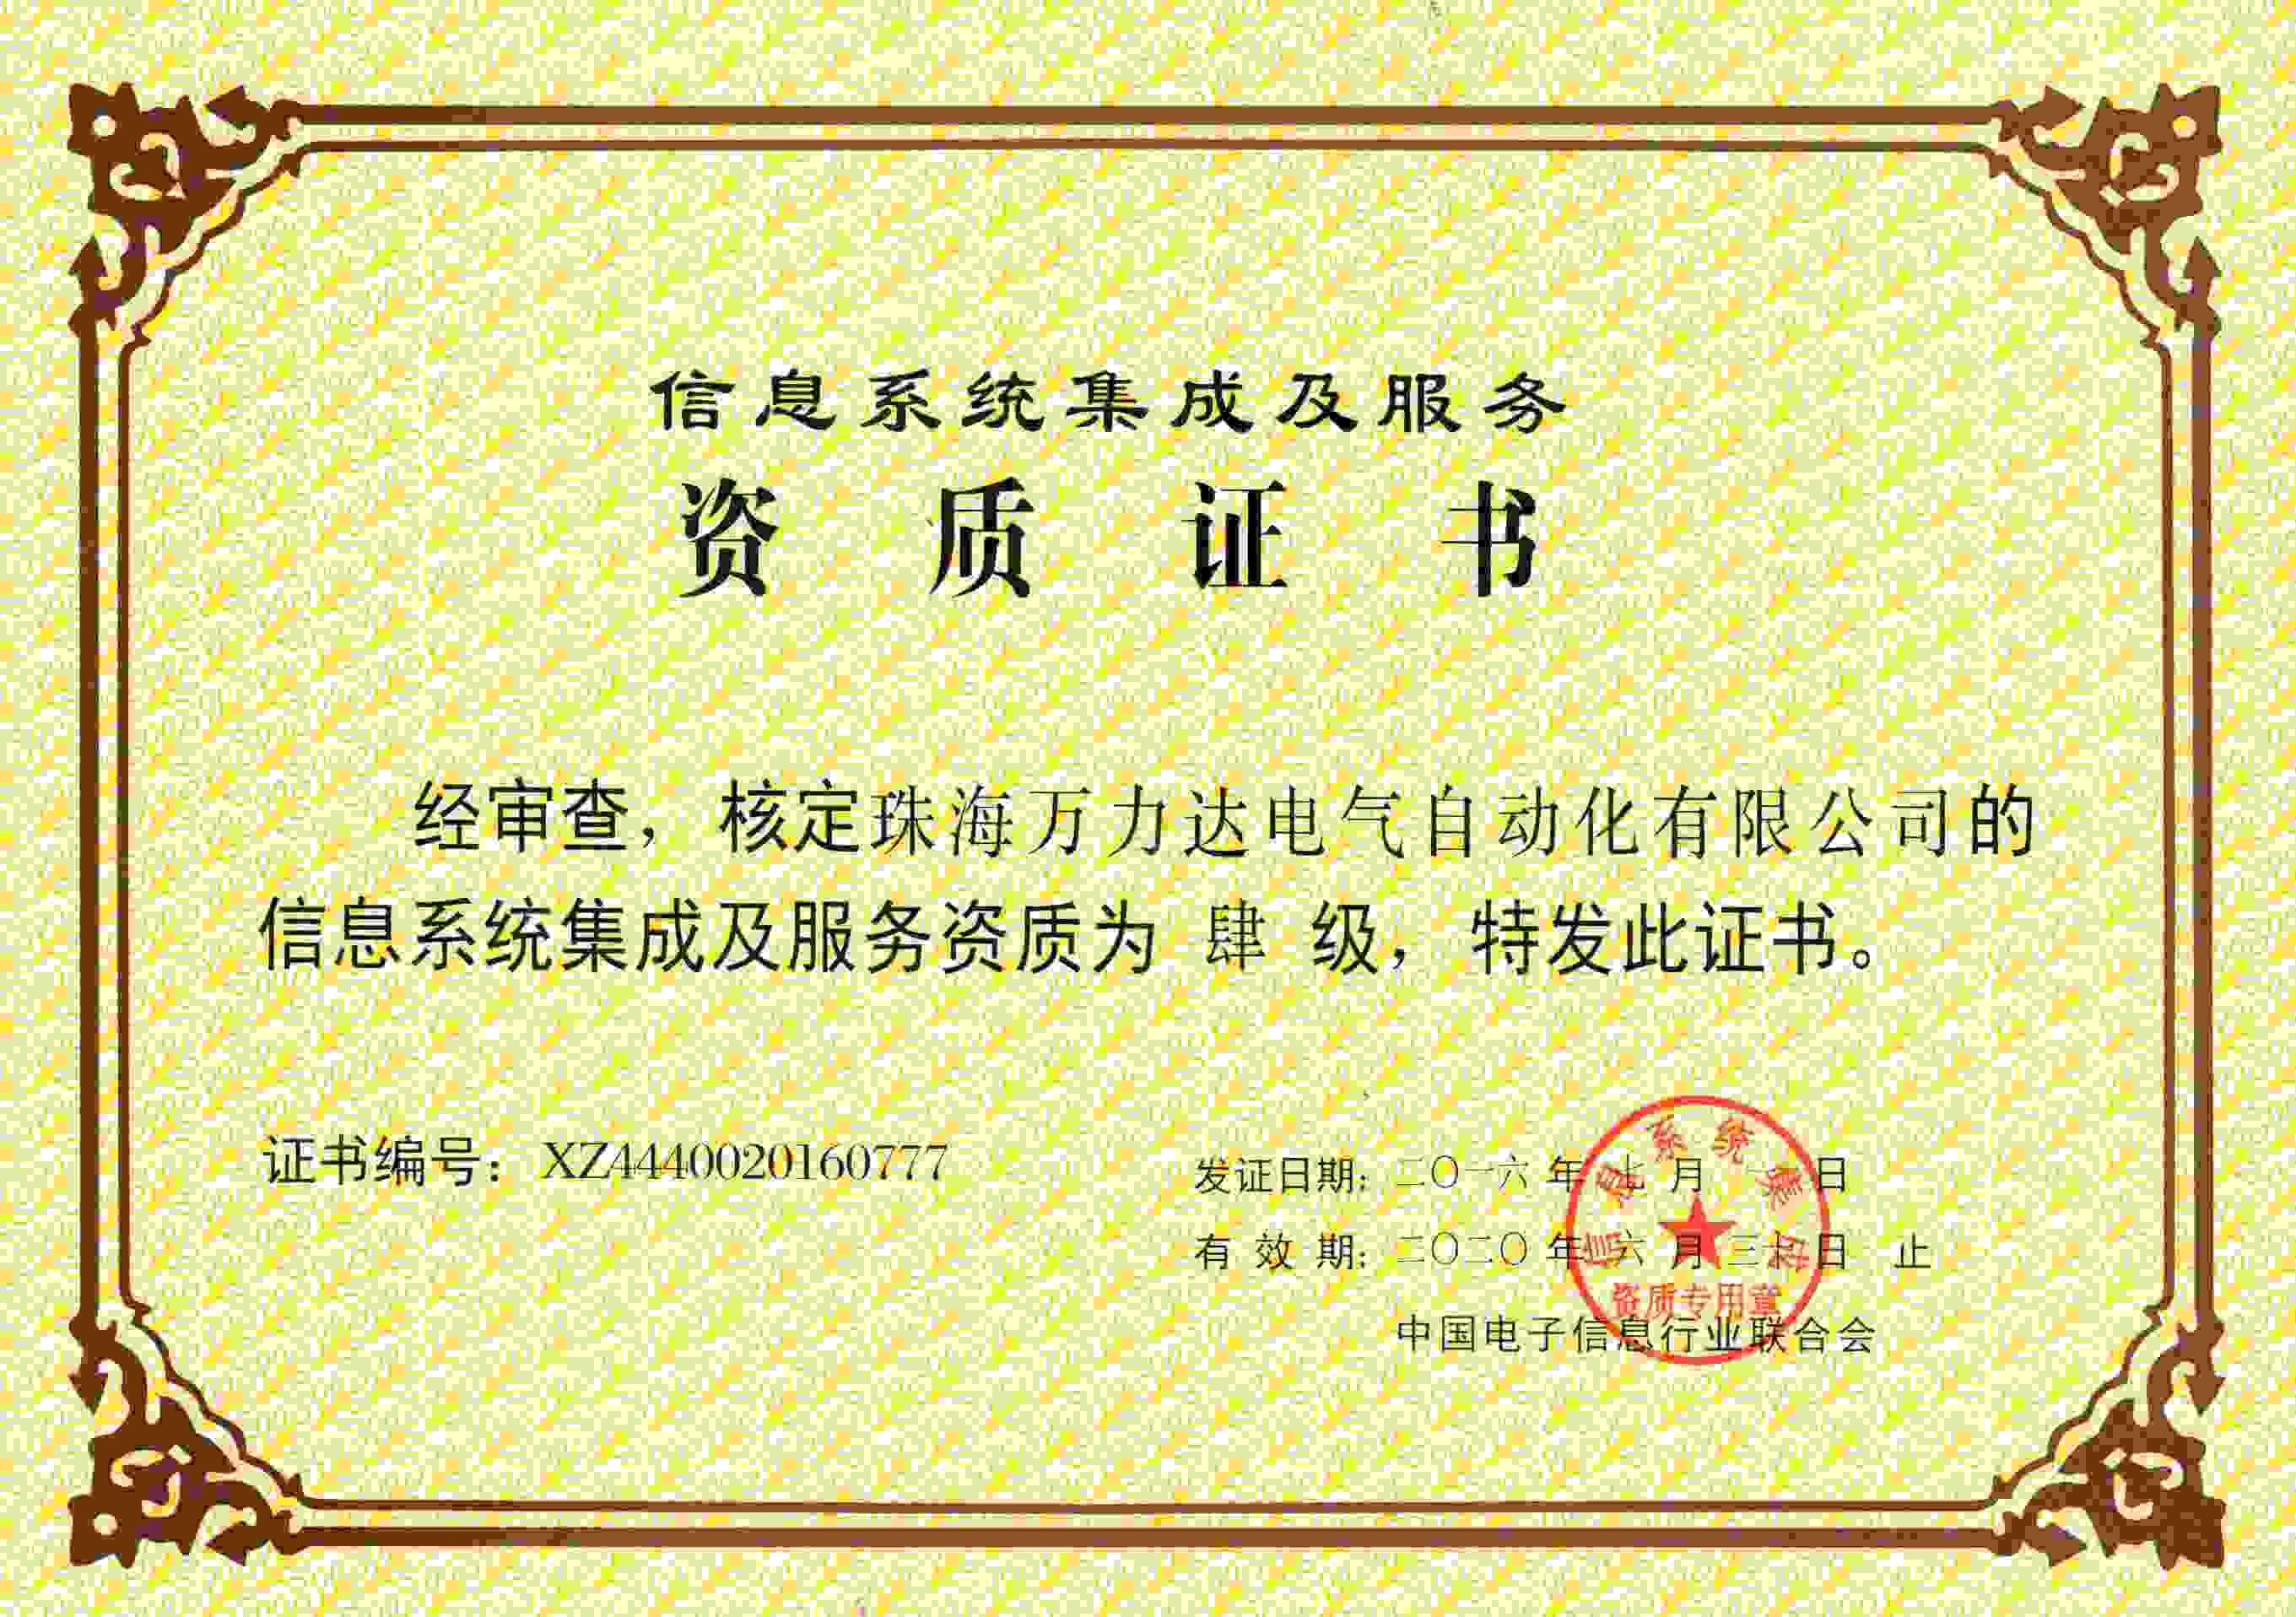 <span>信息系统集成及服务资质证书</span>